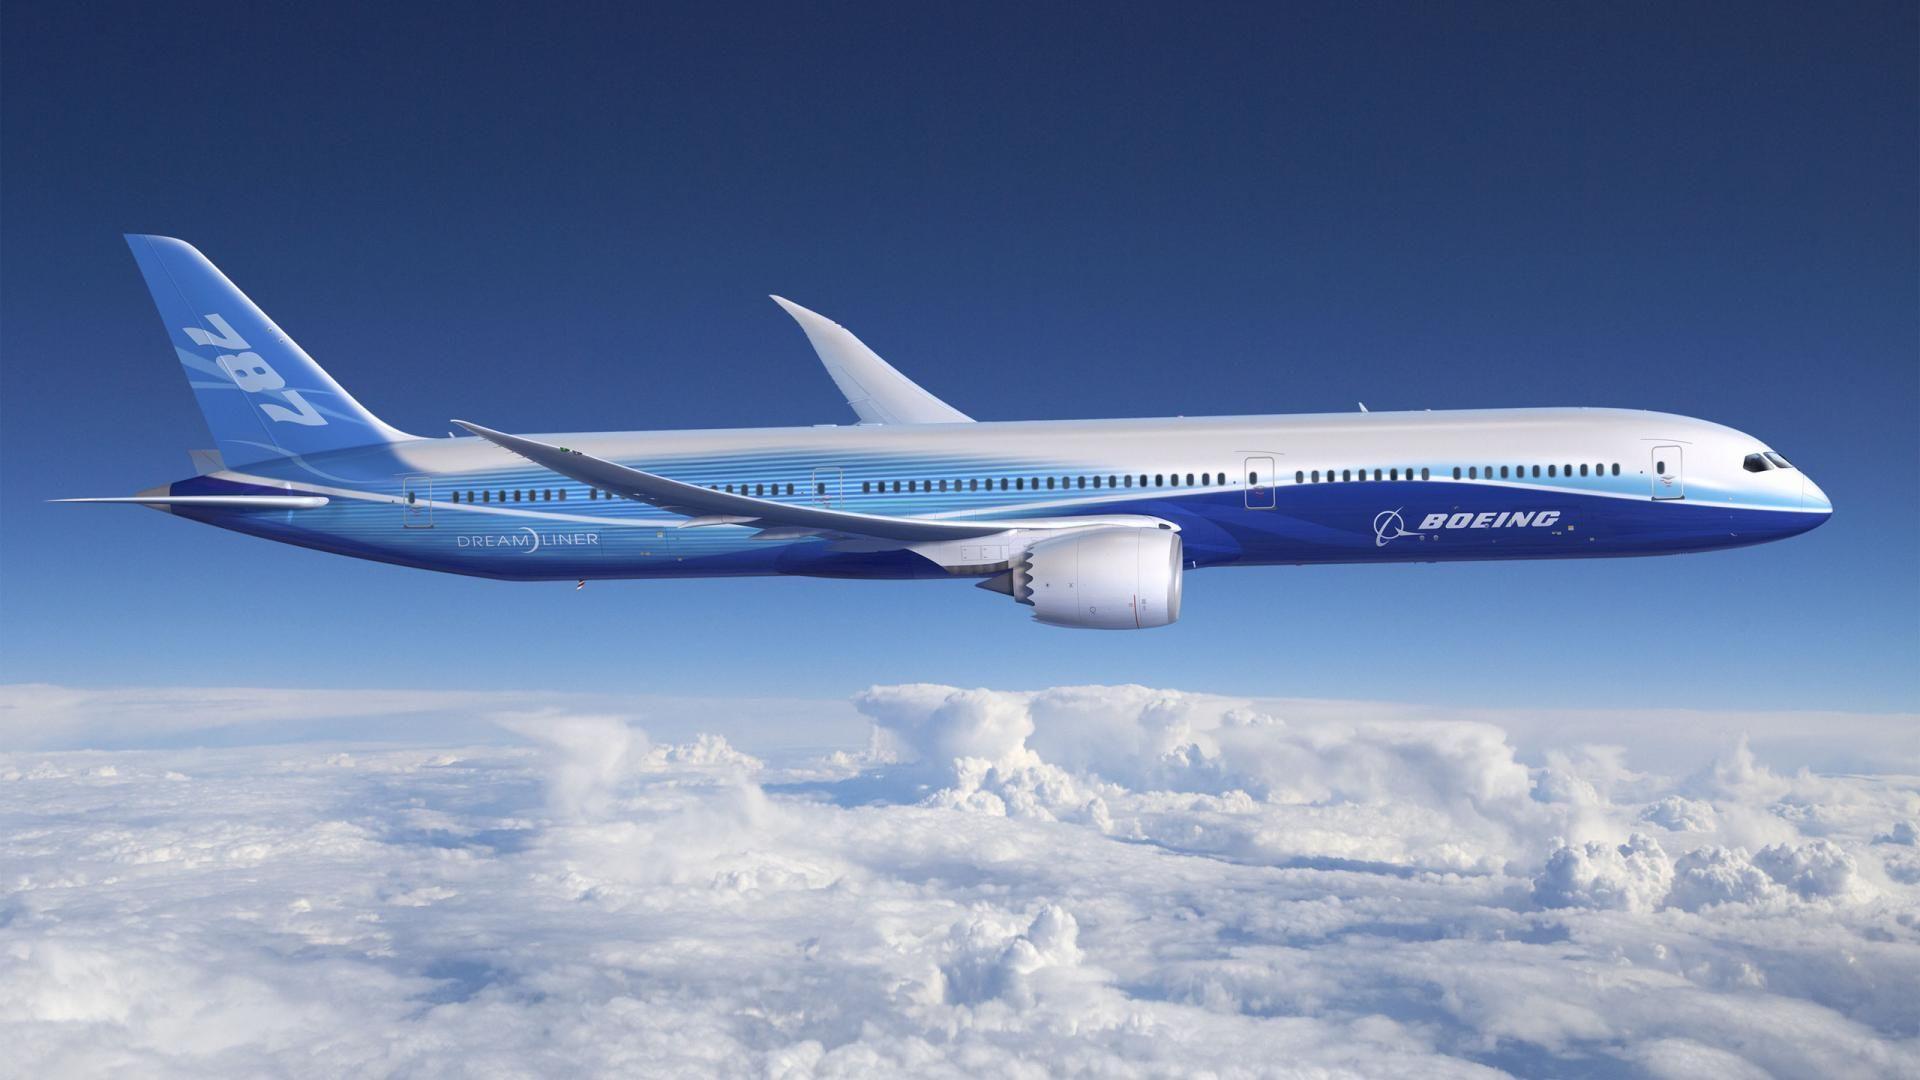 Plane Wallpaper 27 Wallpapers Hd Wallpapers Boeing 787